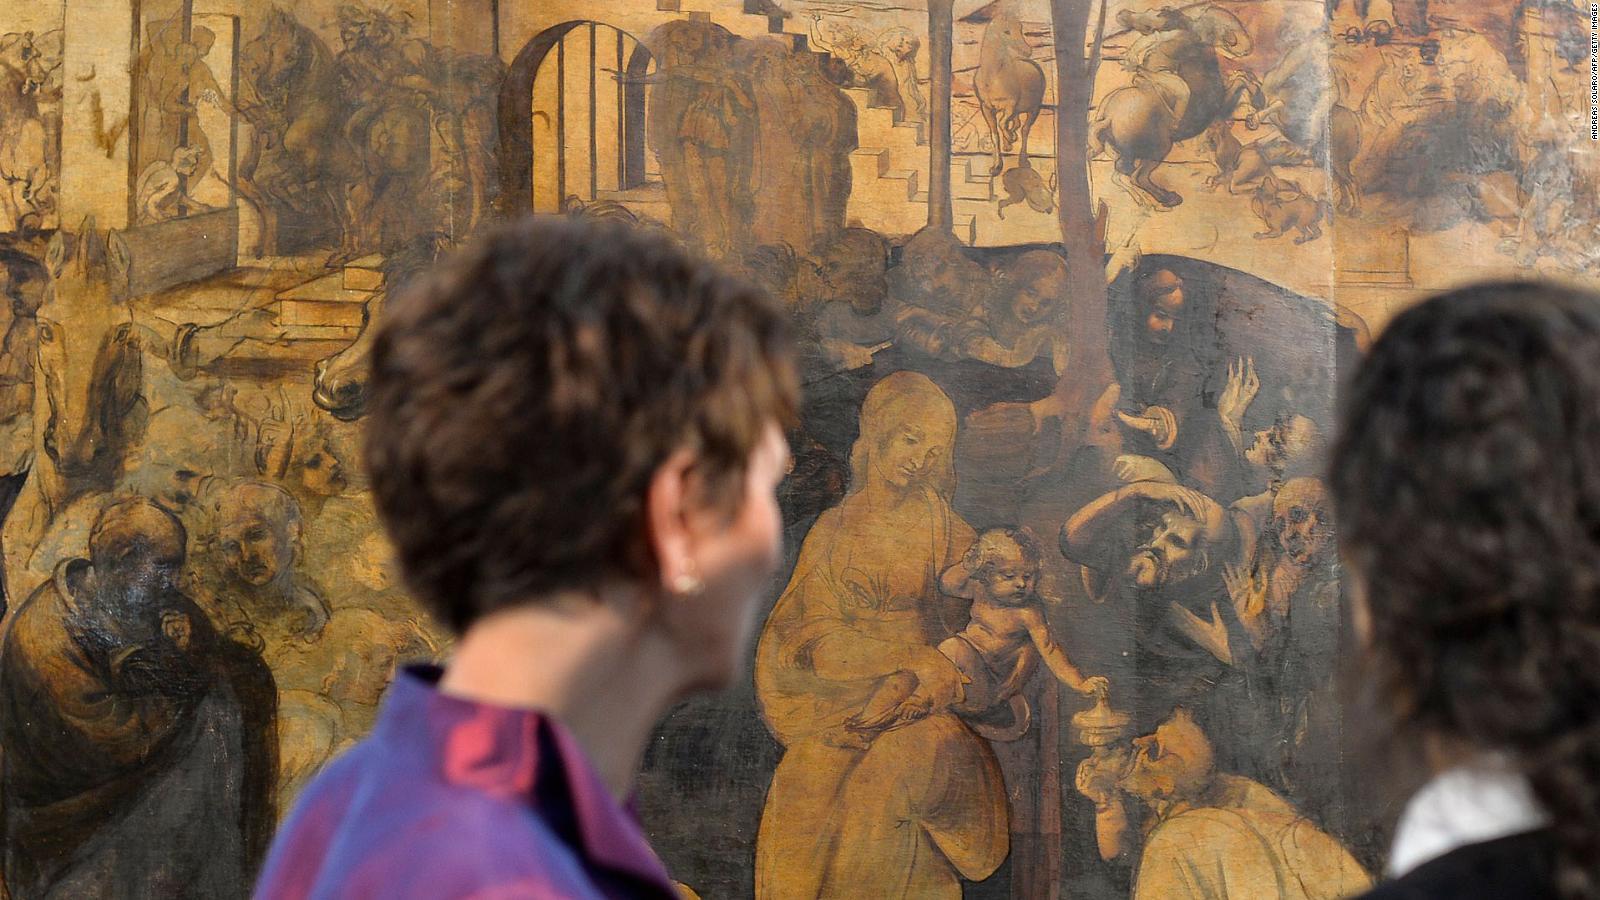 Take Leonardo da Vinci tour of Italy on 500th anniversary | CNN Travel